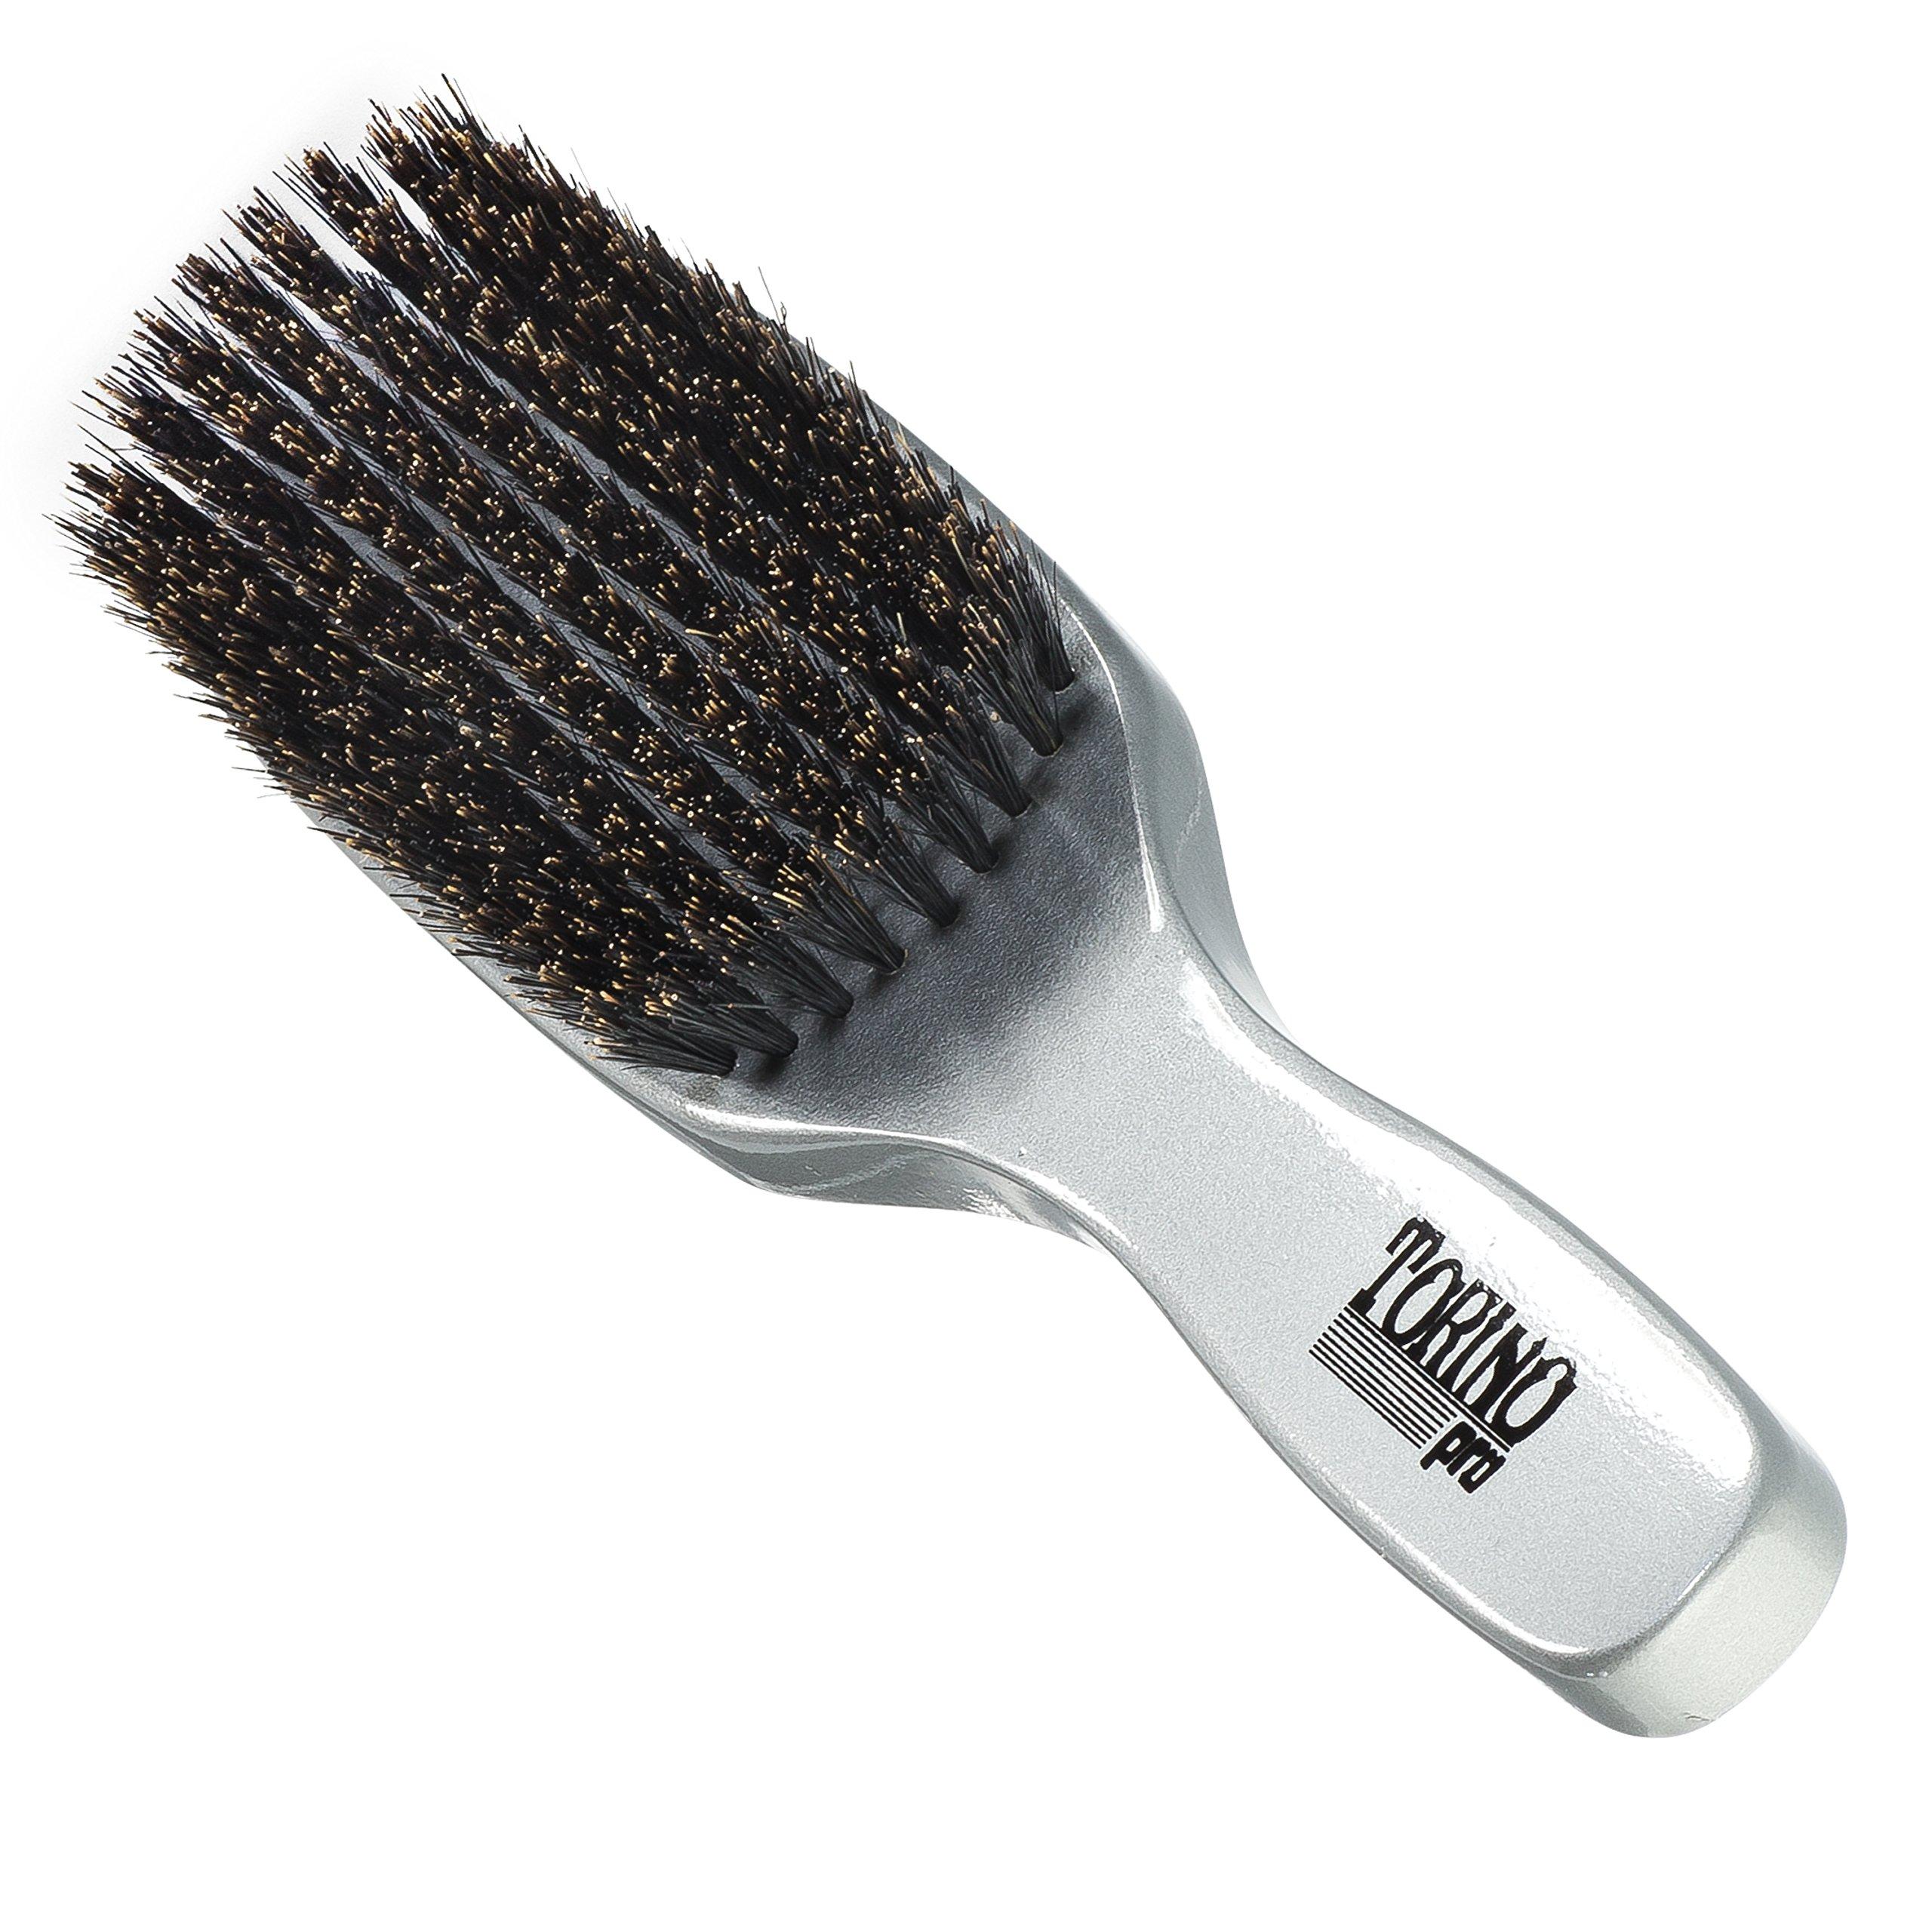 Torino Pro Wave Brush #510 By Brush King - 9 Row, Medium Wave Brush with Long Bristles - Made with 100% Boar Bristles -True Texture Medium - All Purpose 360 Waves Brush